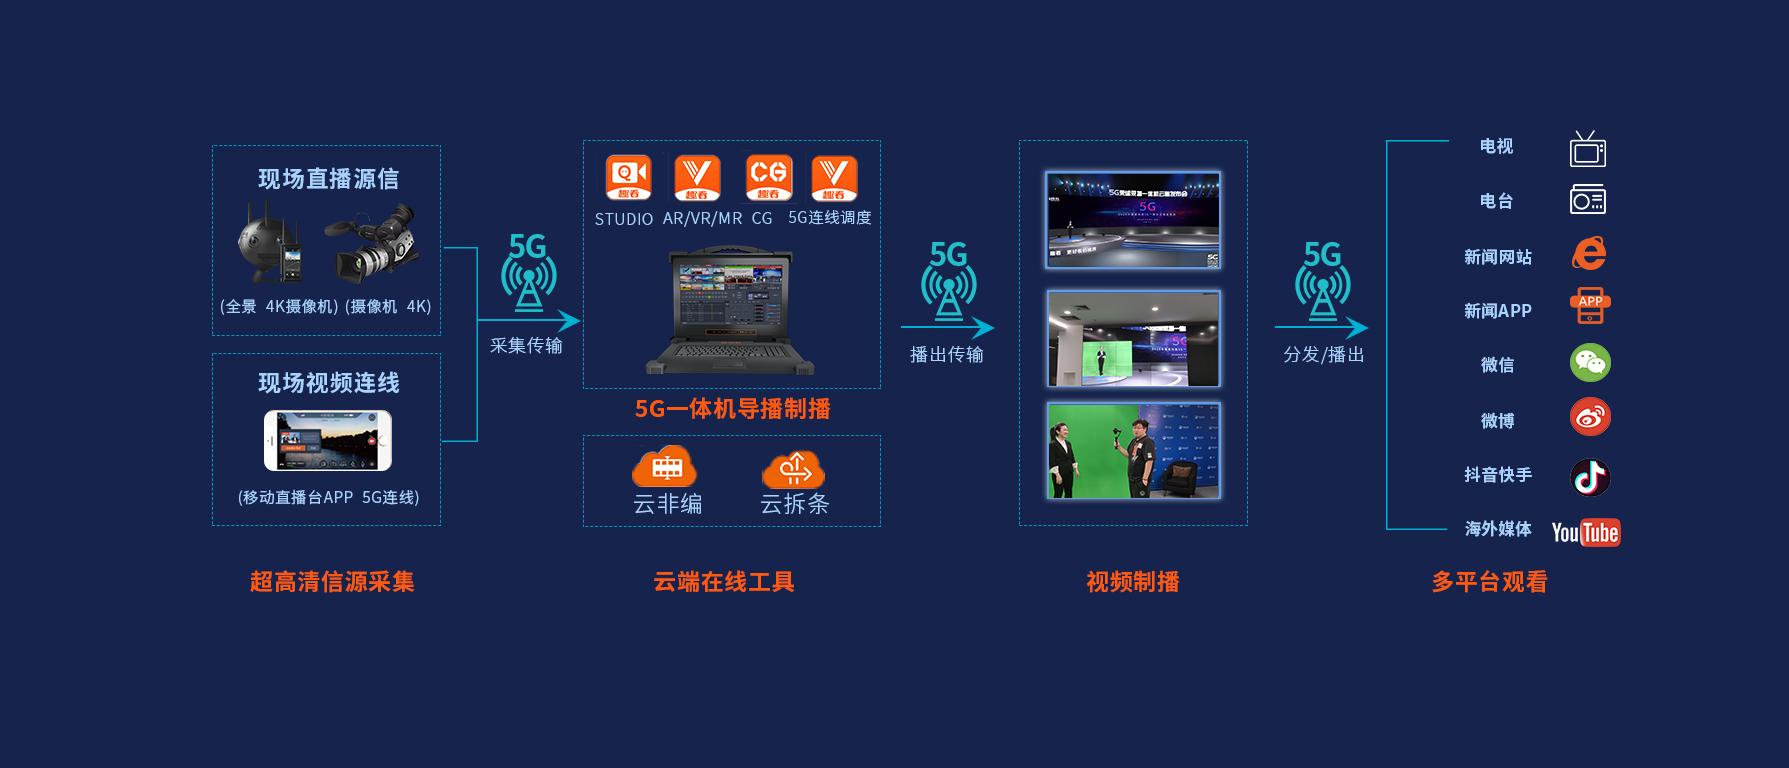 5G移动演播室架构.png